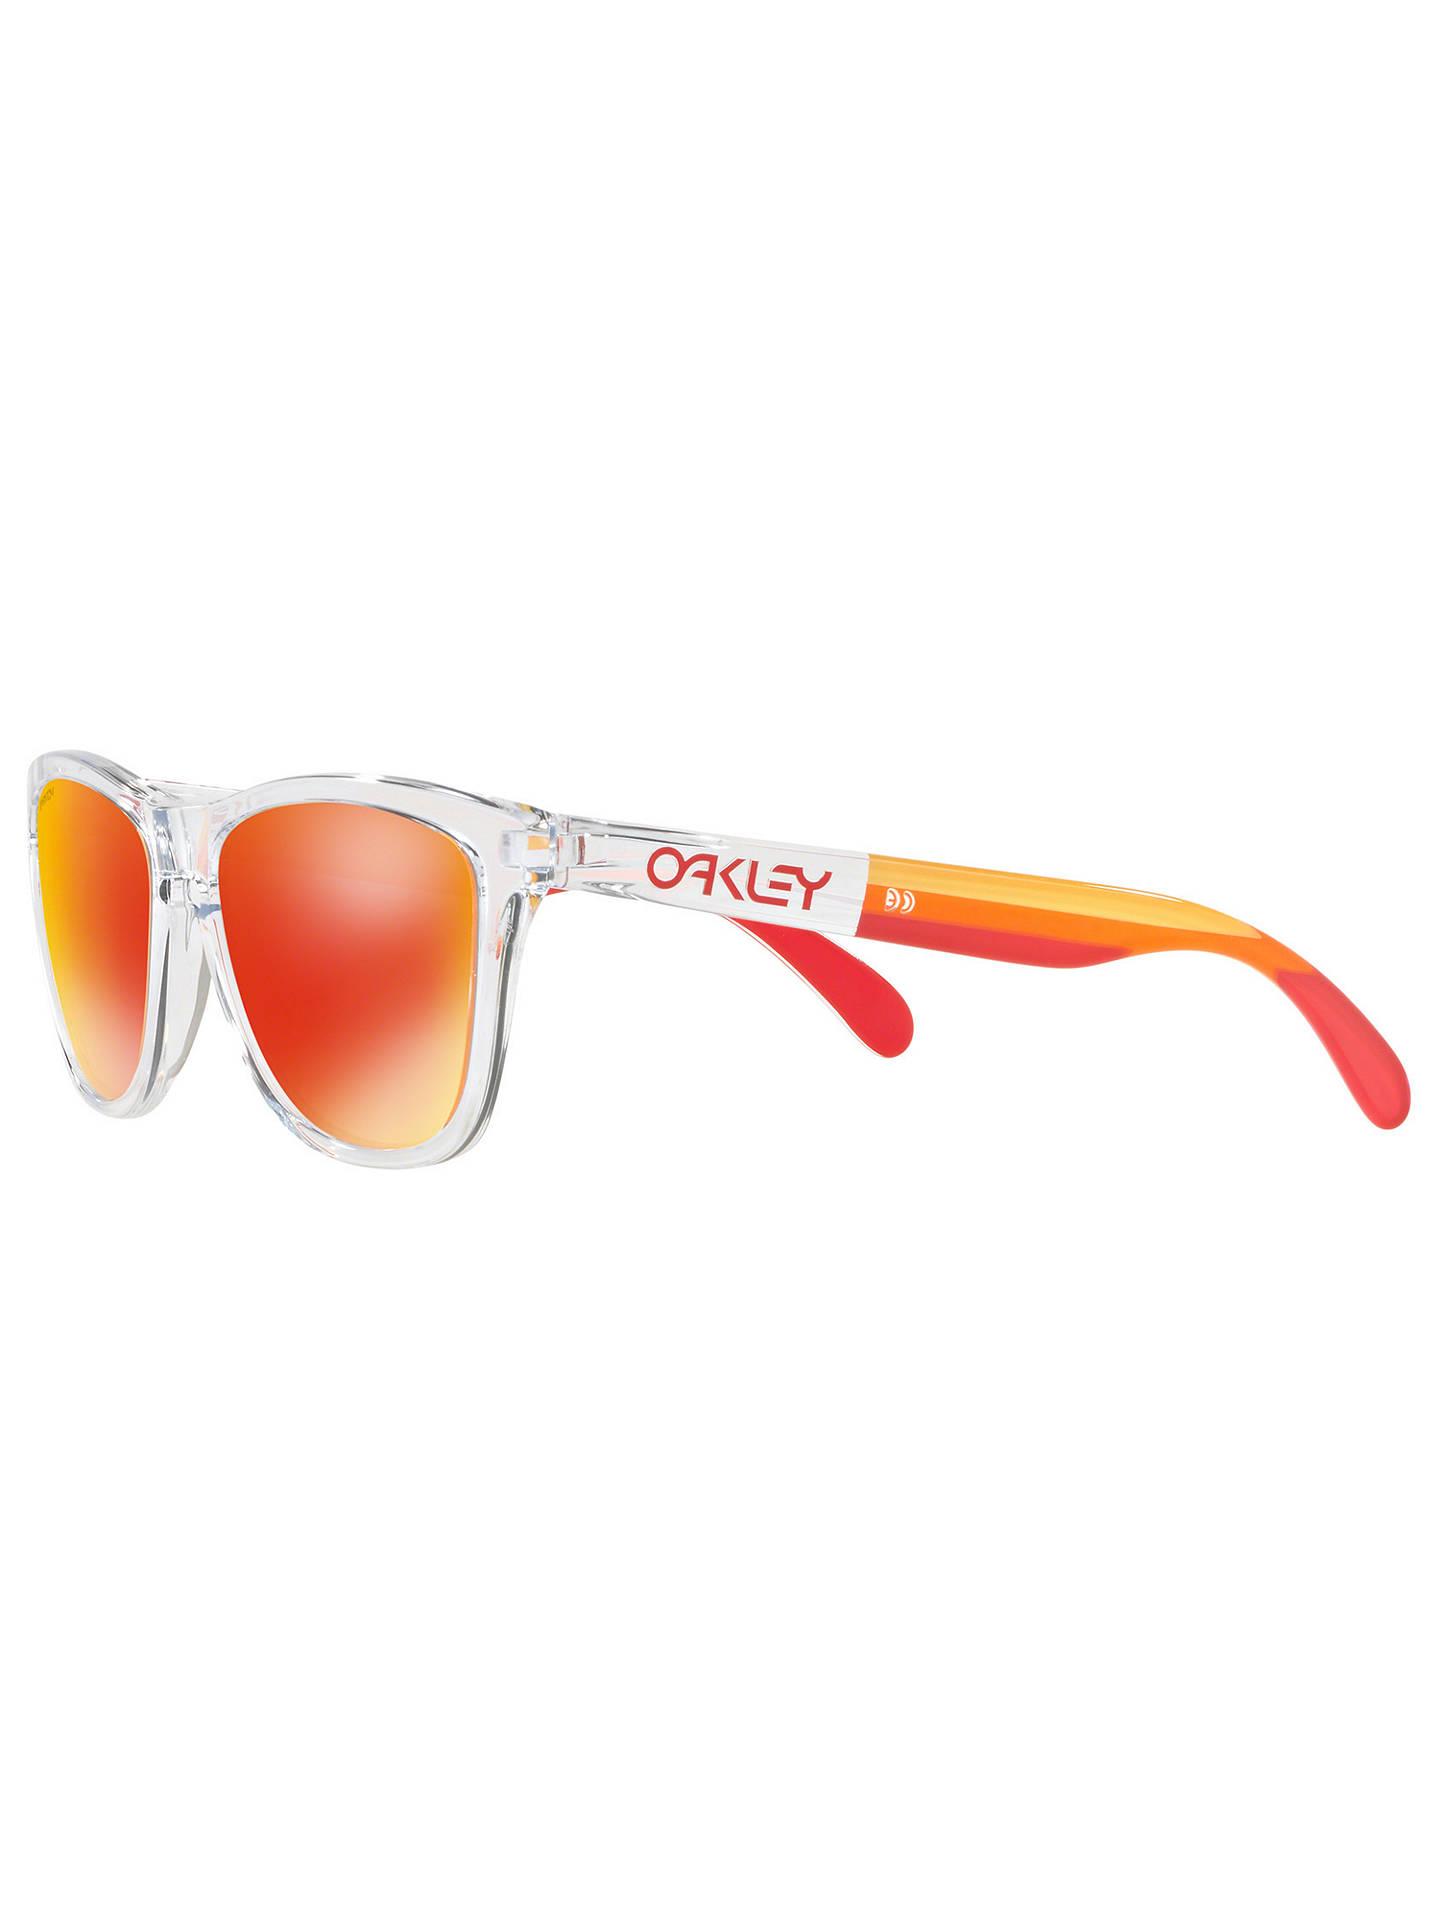 17ec50b376 cheap oakley frogskins sunglasses rainbow cake 7ccc4 5338c